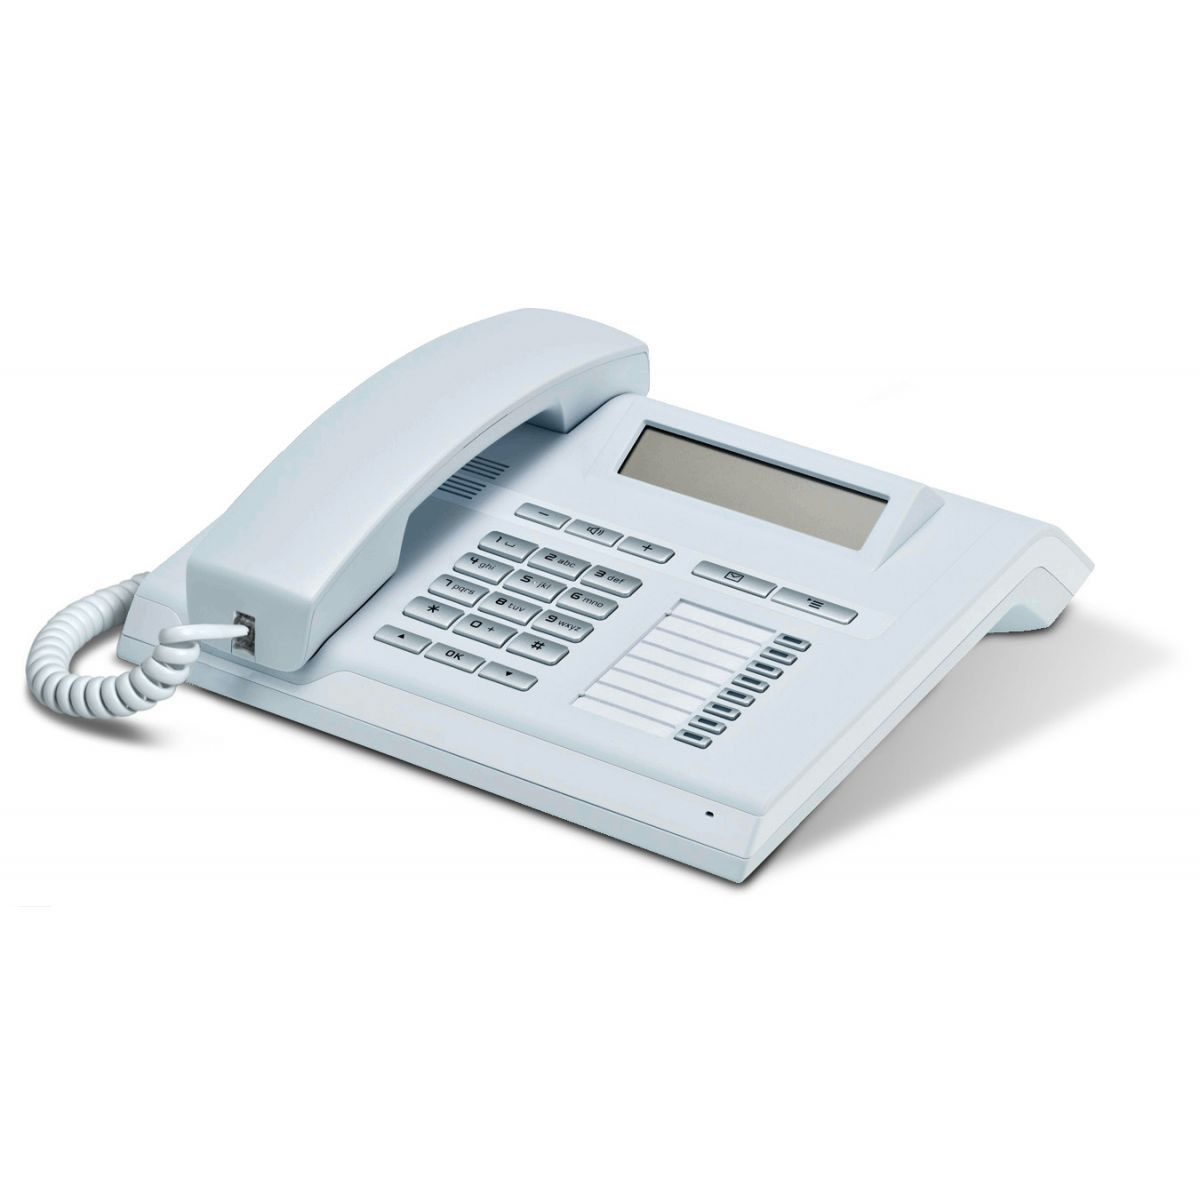 Telefone Digital OpenStage 15 TDM - Unify/Siemens